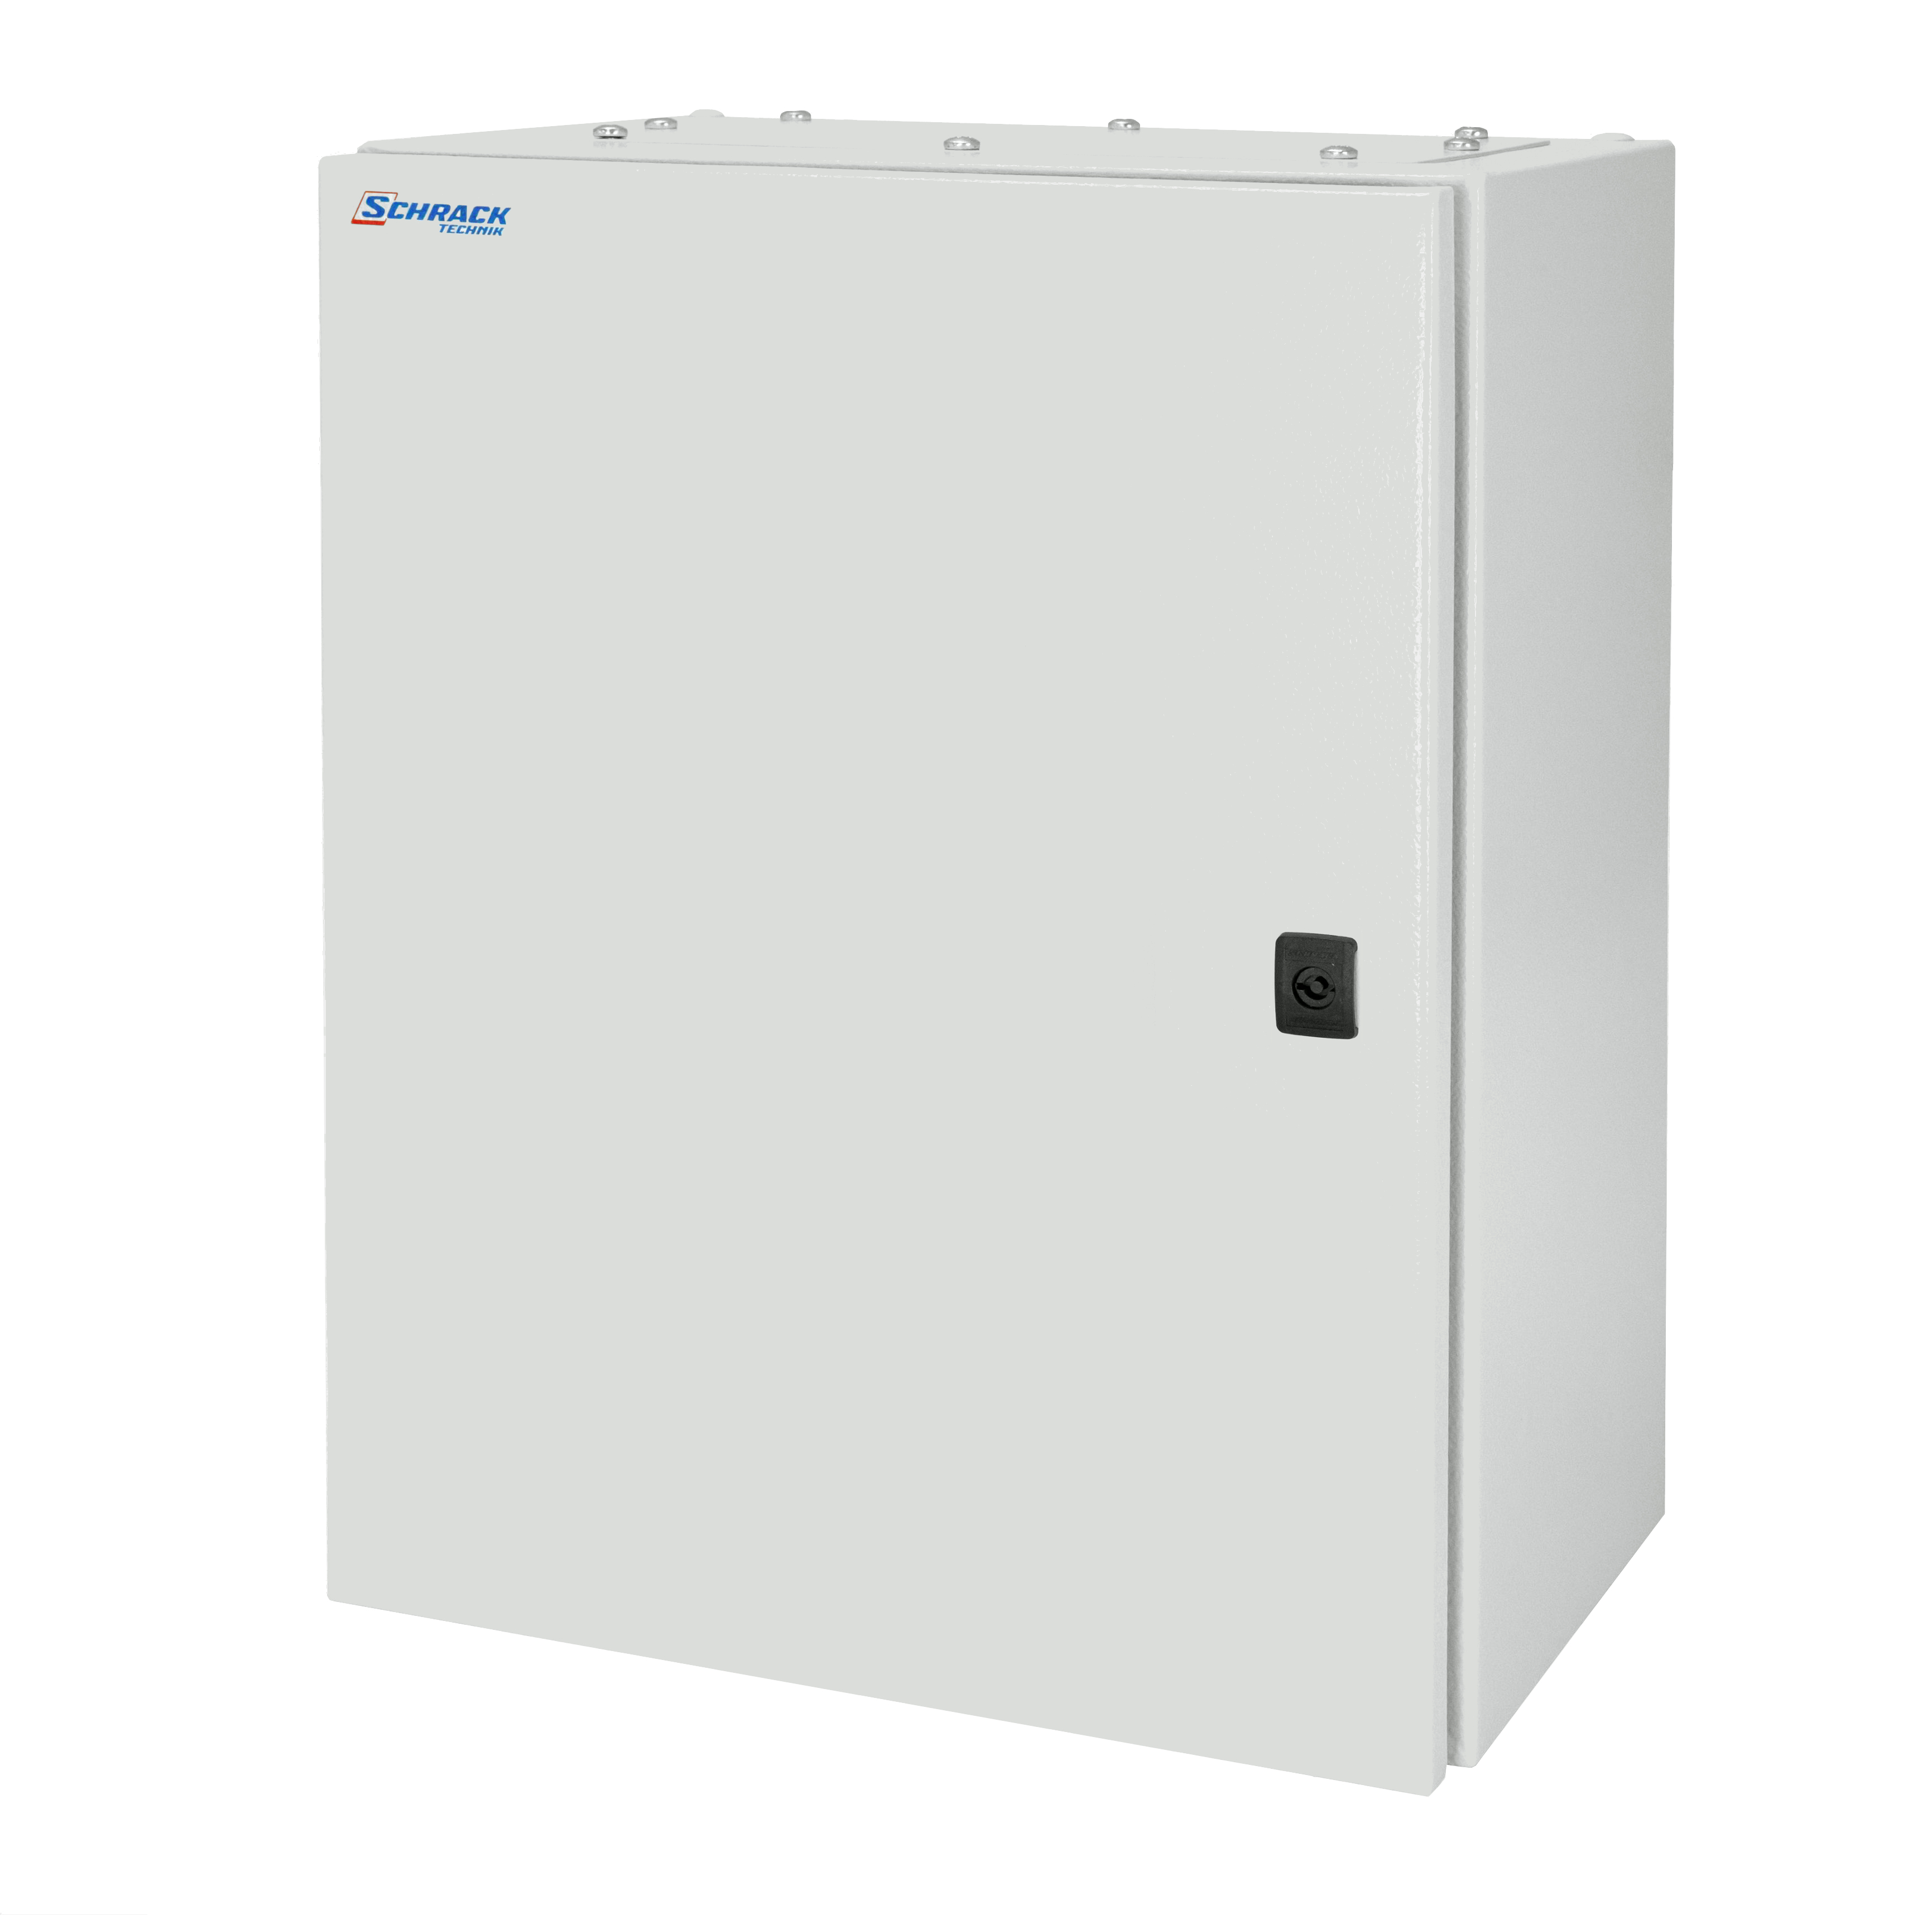 1 Stk Wandschrank Mono IP66 H=500 B=500 T=300 Stahlblech WSM5050300